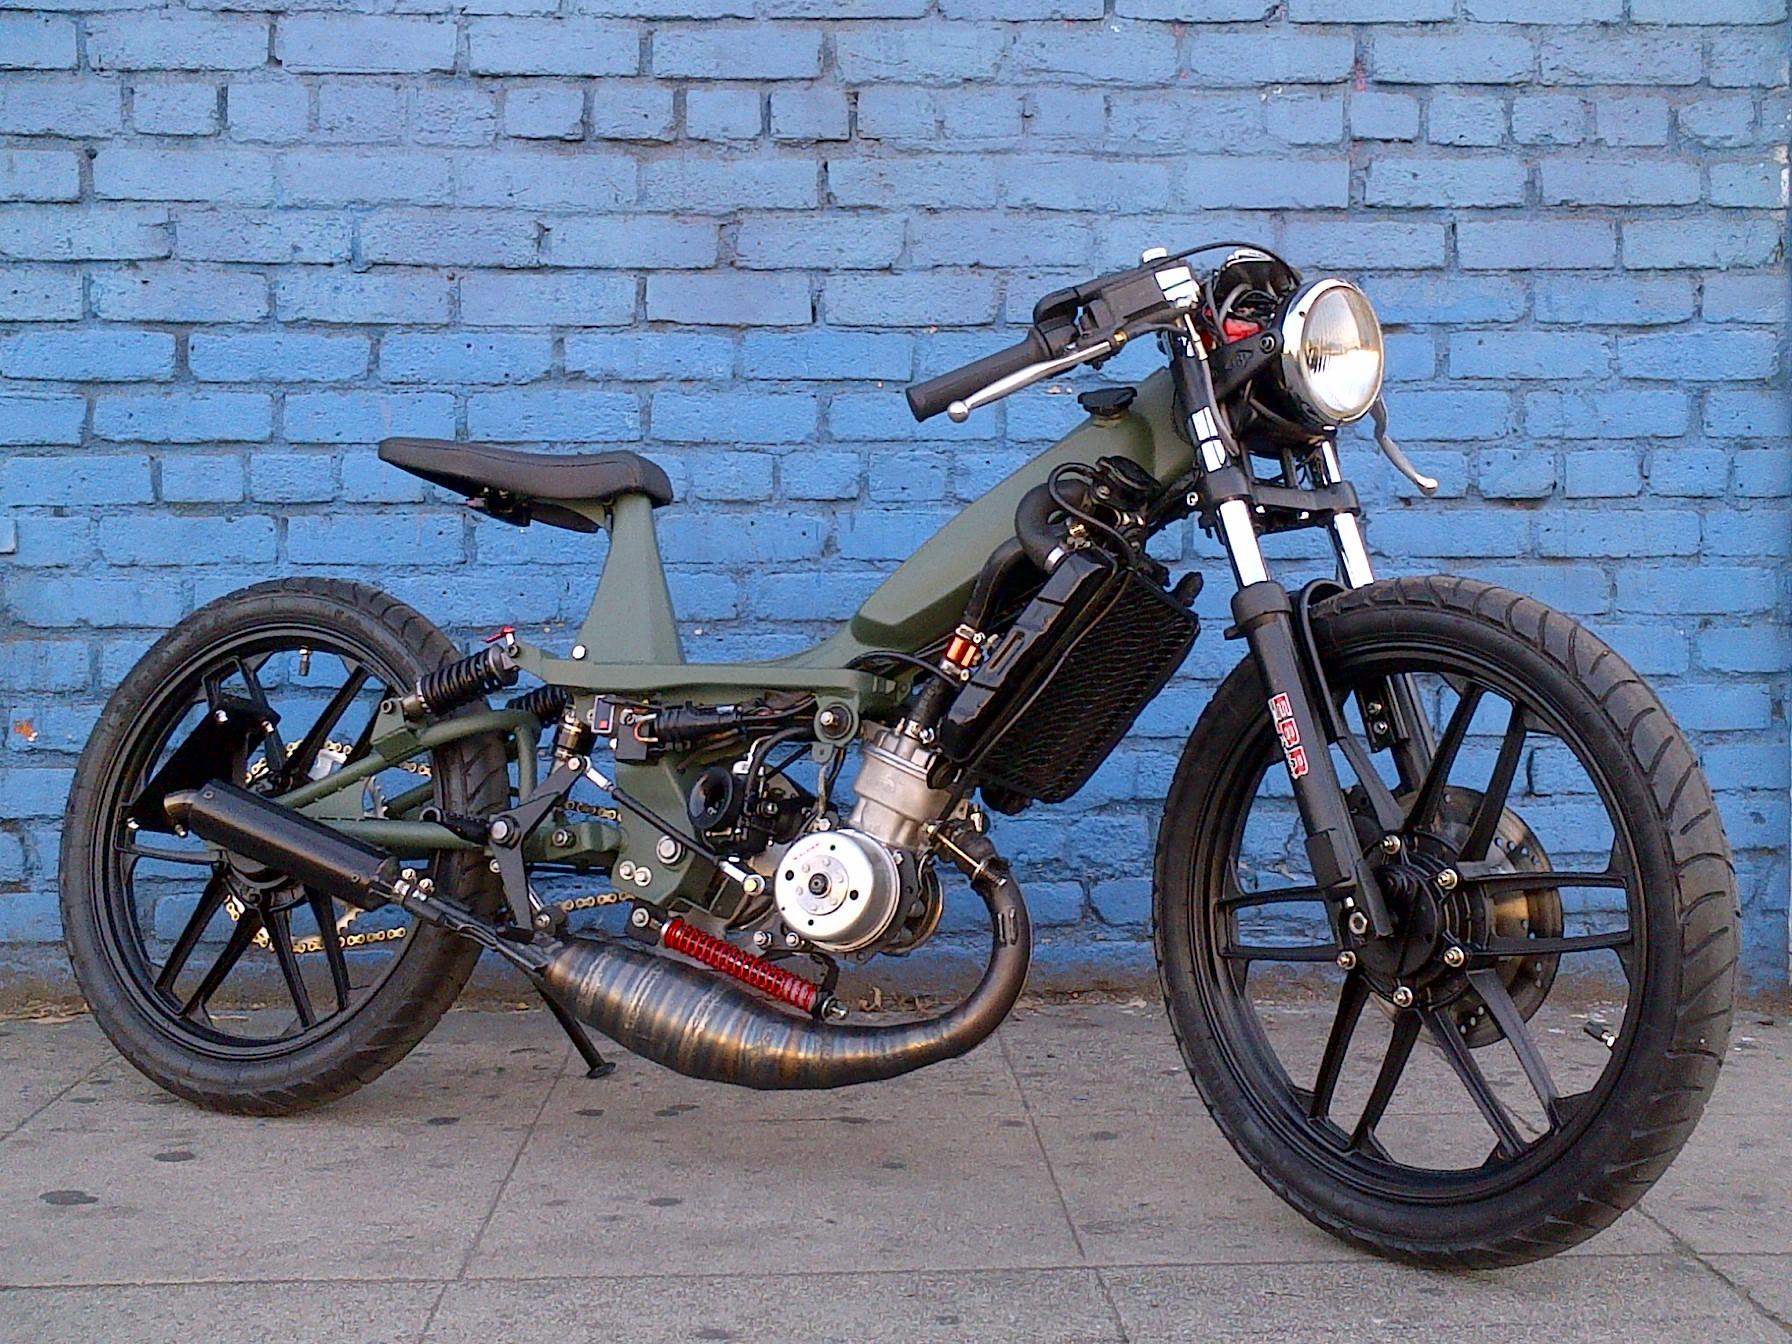 mbk 51 mg street fighter tomahawk mopeds. Black Bedroom Furniture Sets. Home Design Ideas